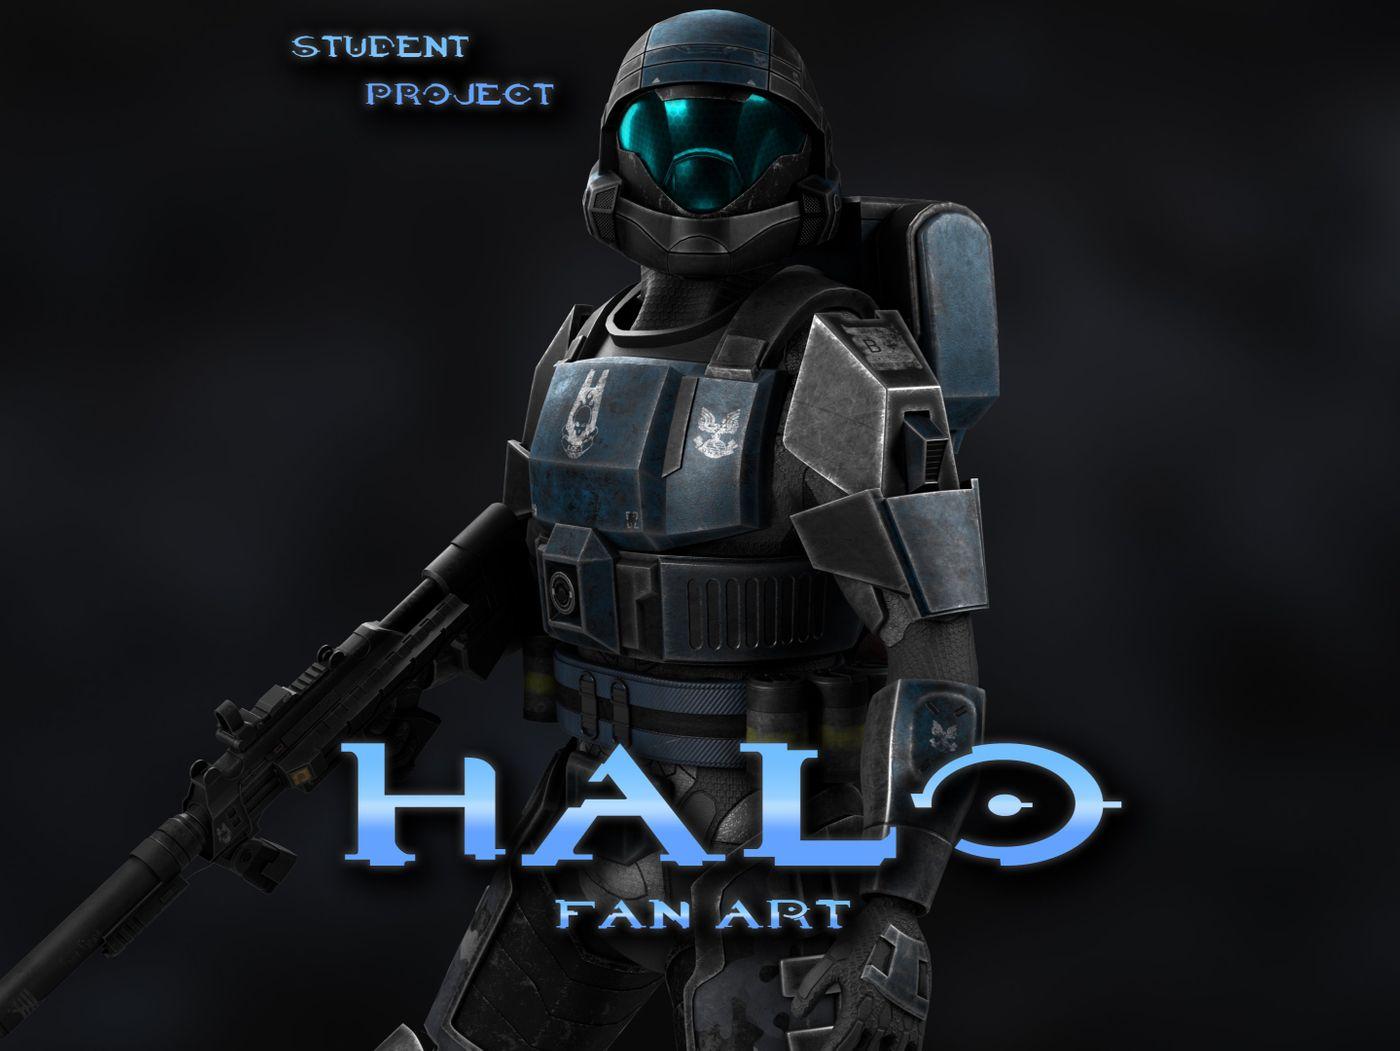 Hope - Halo Themed Senior Project